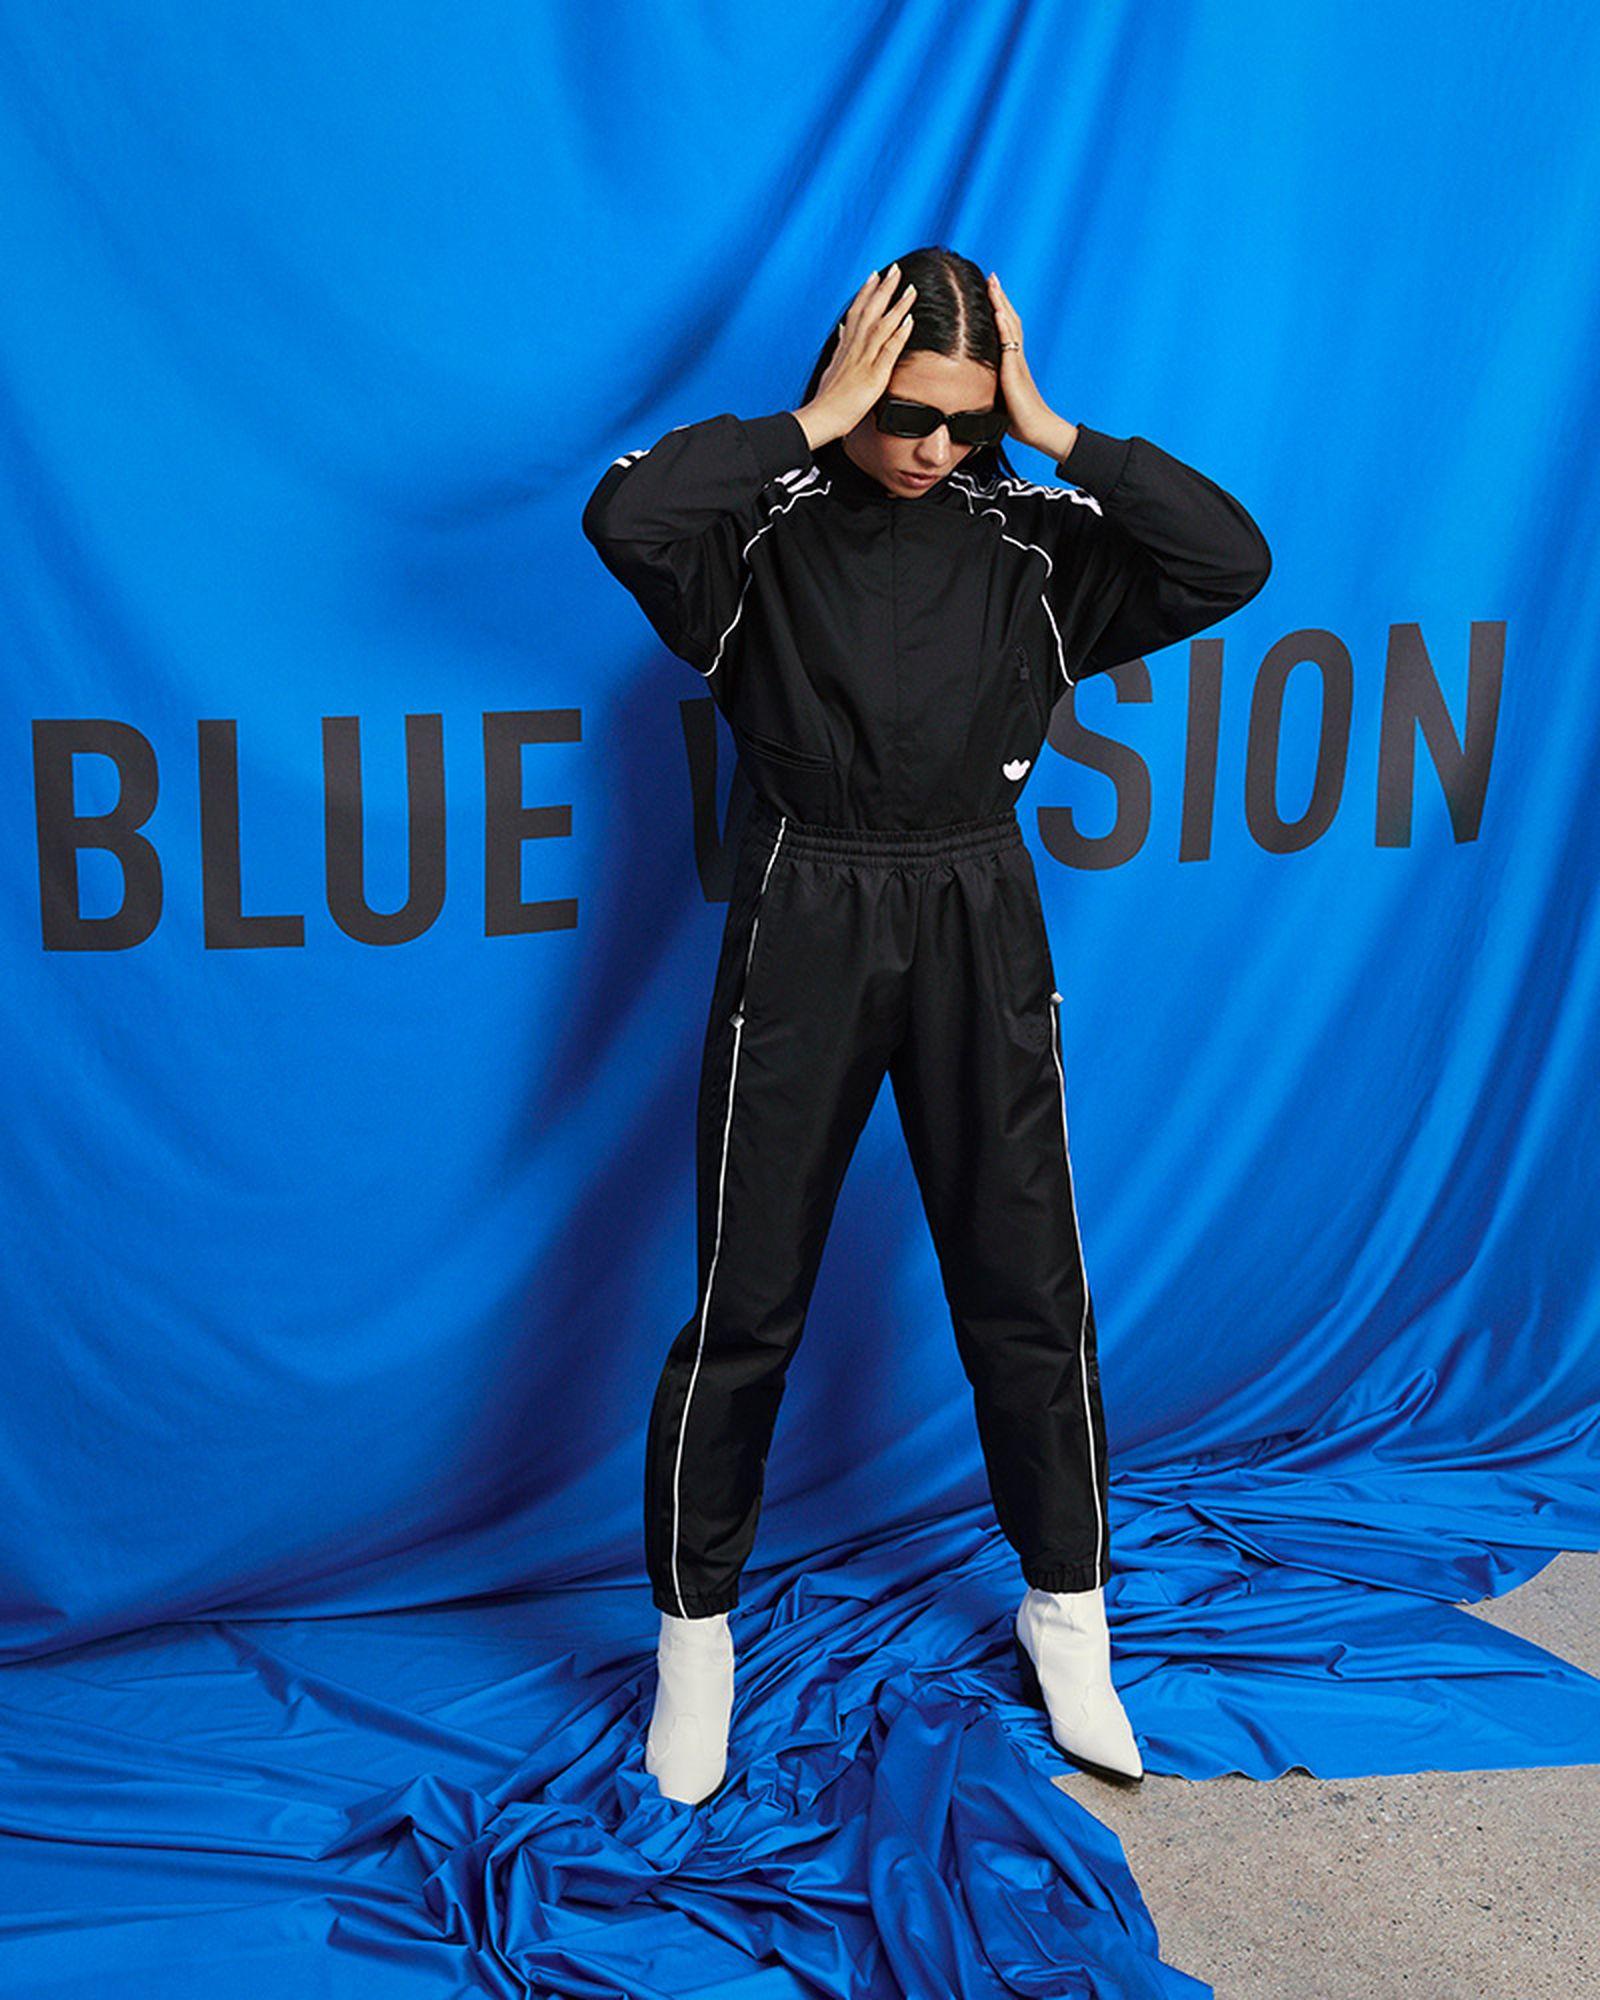 adidas-originals-blue-version-release-info-01